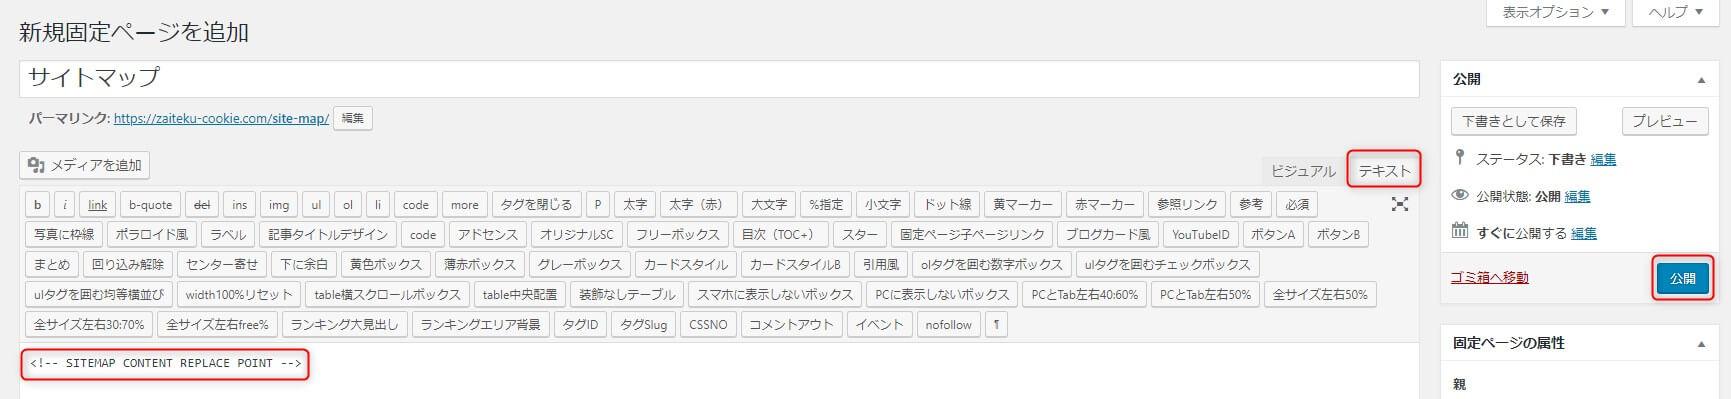 ps_auto_sitemapインストール手順7